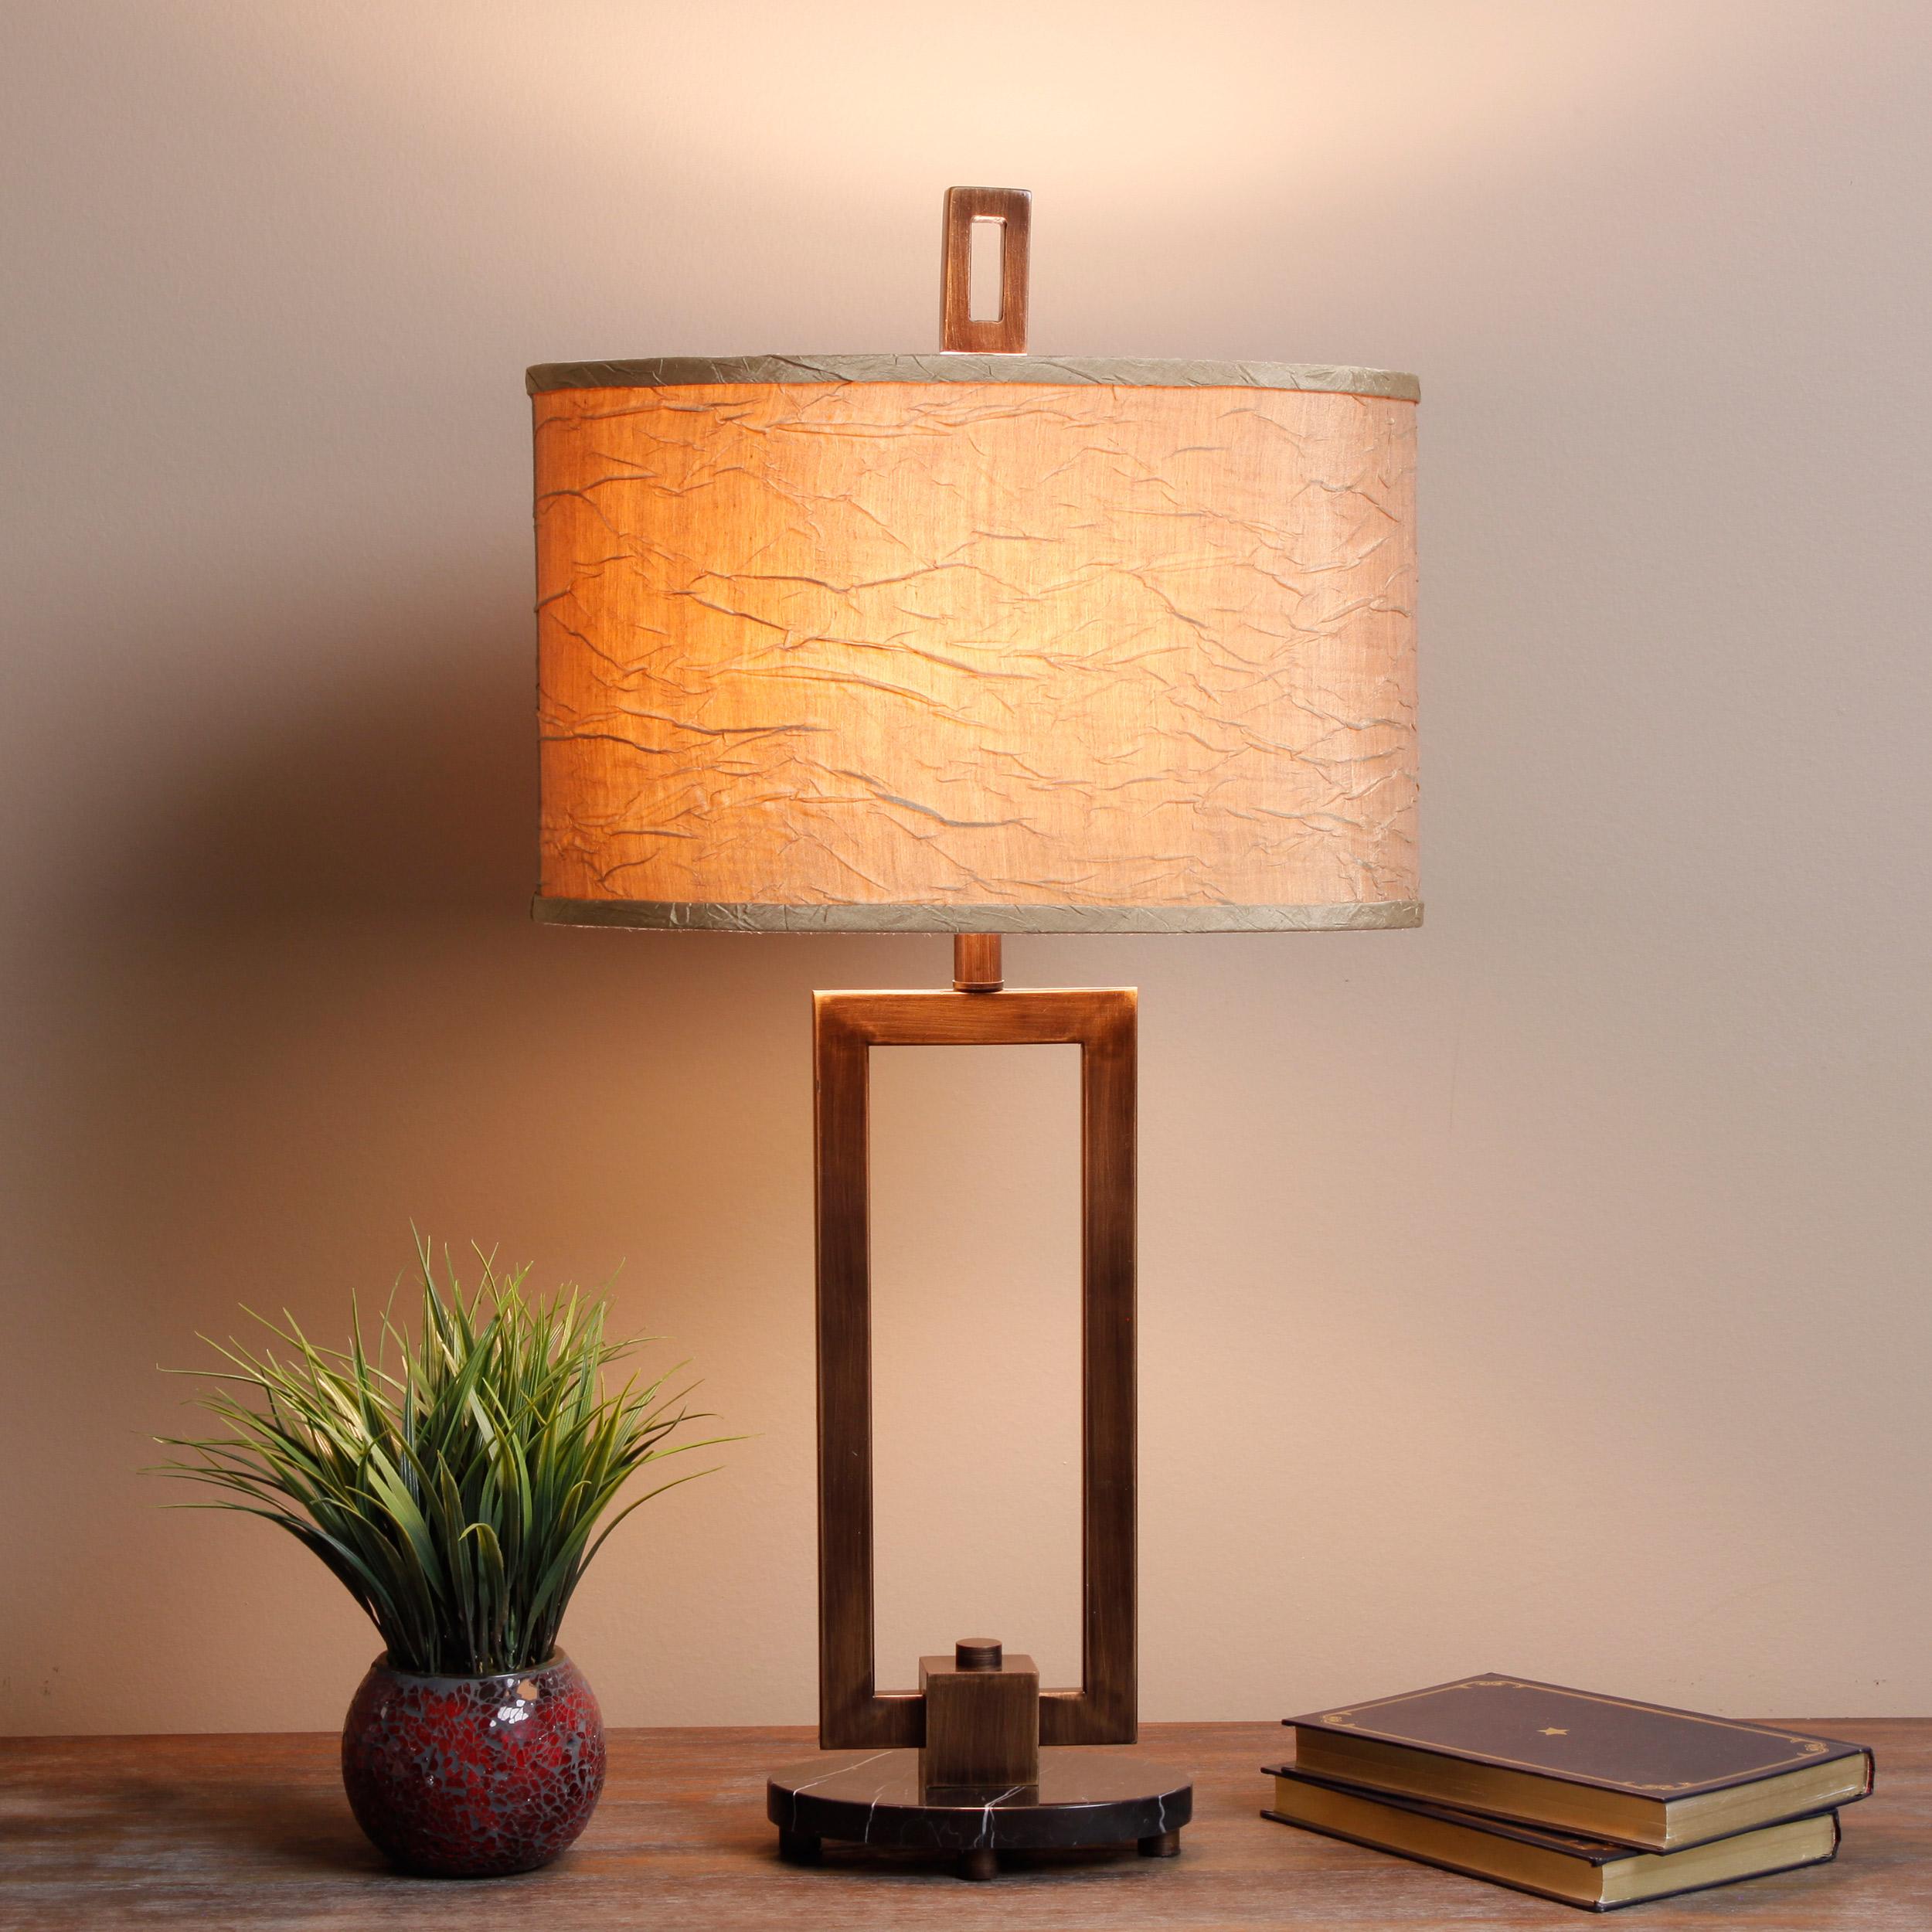 Creative 3 Way Table Lamps | HomesFeed